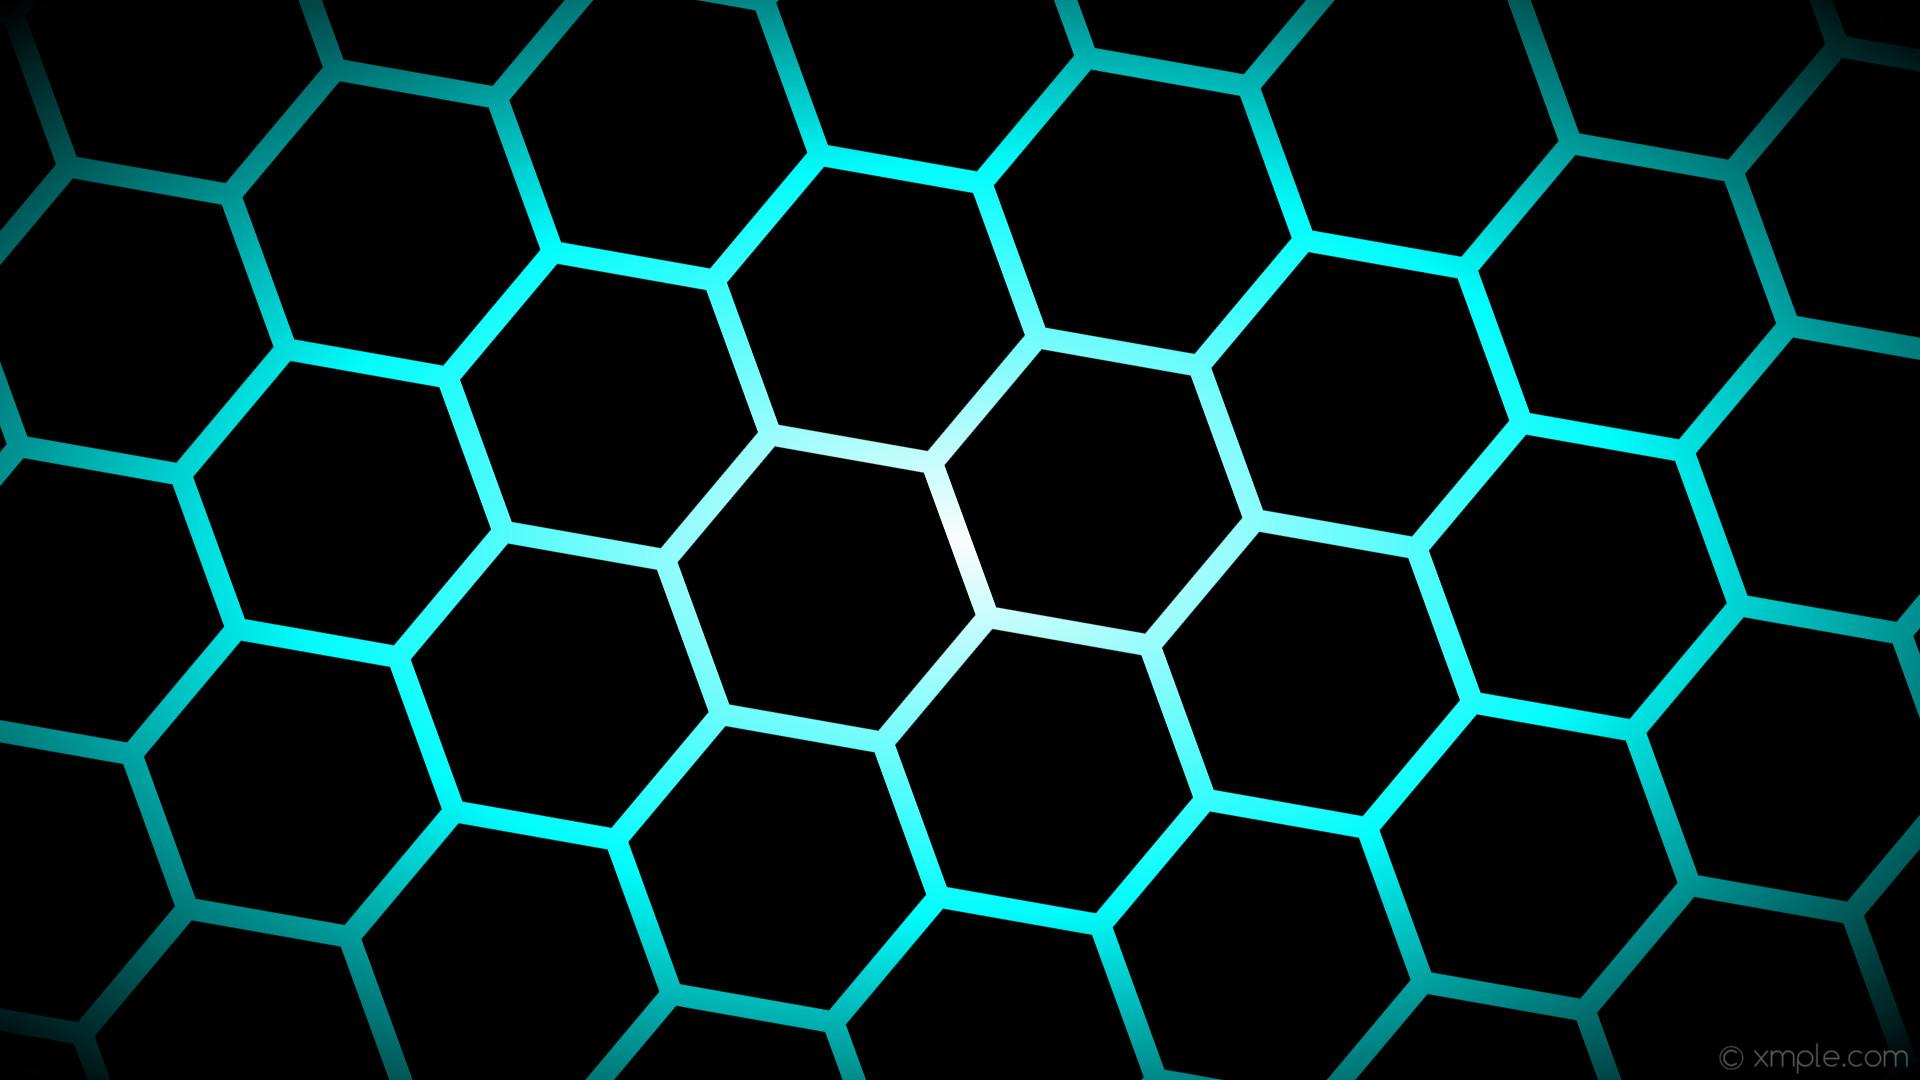 wallpaper glow hexagon black blue white gradient aqua cyan #000000 #ffffff  #00ffff diagonal